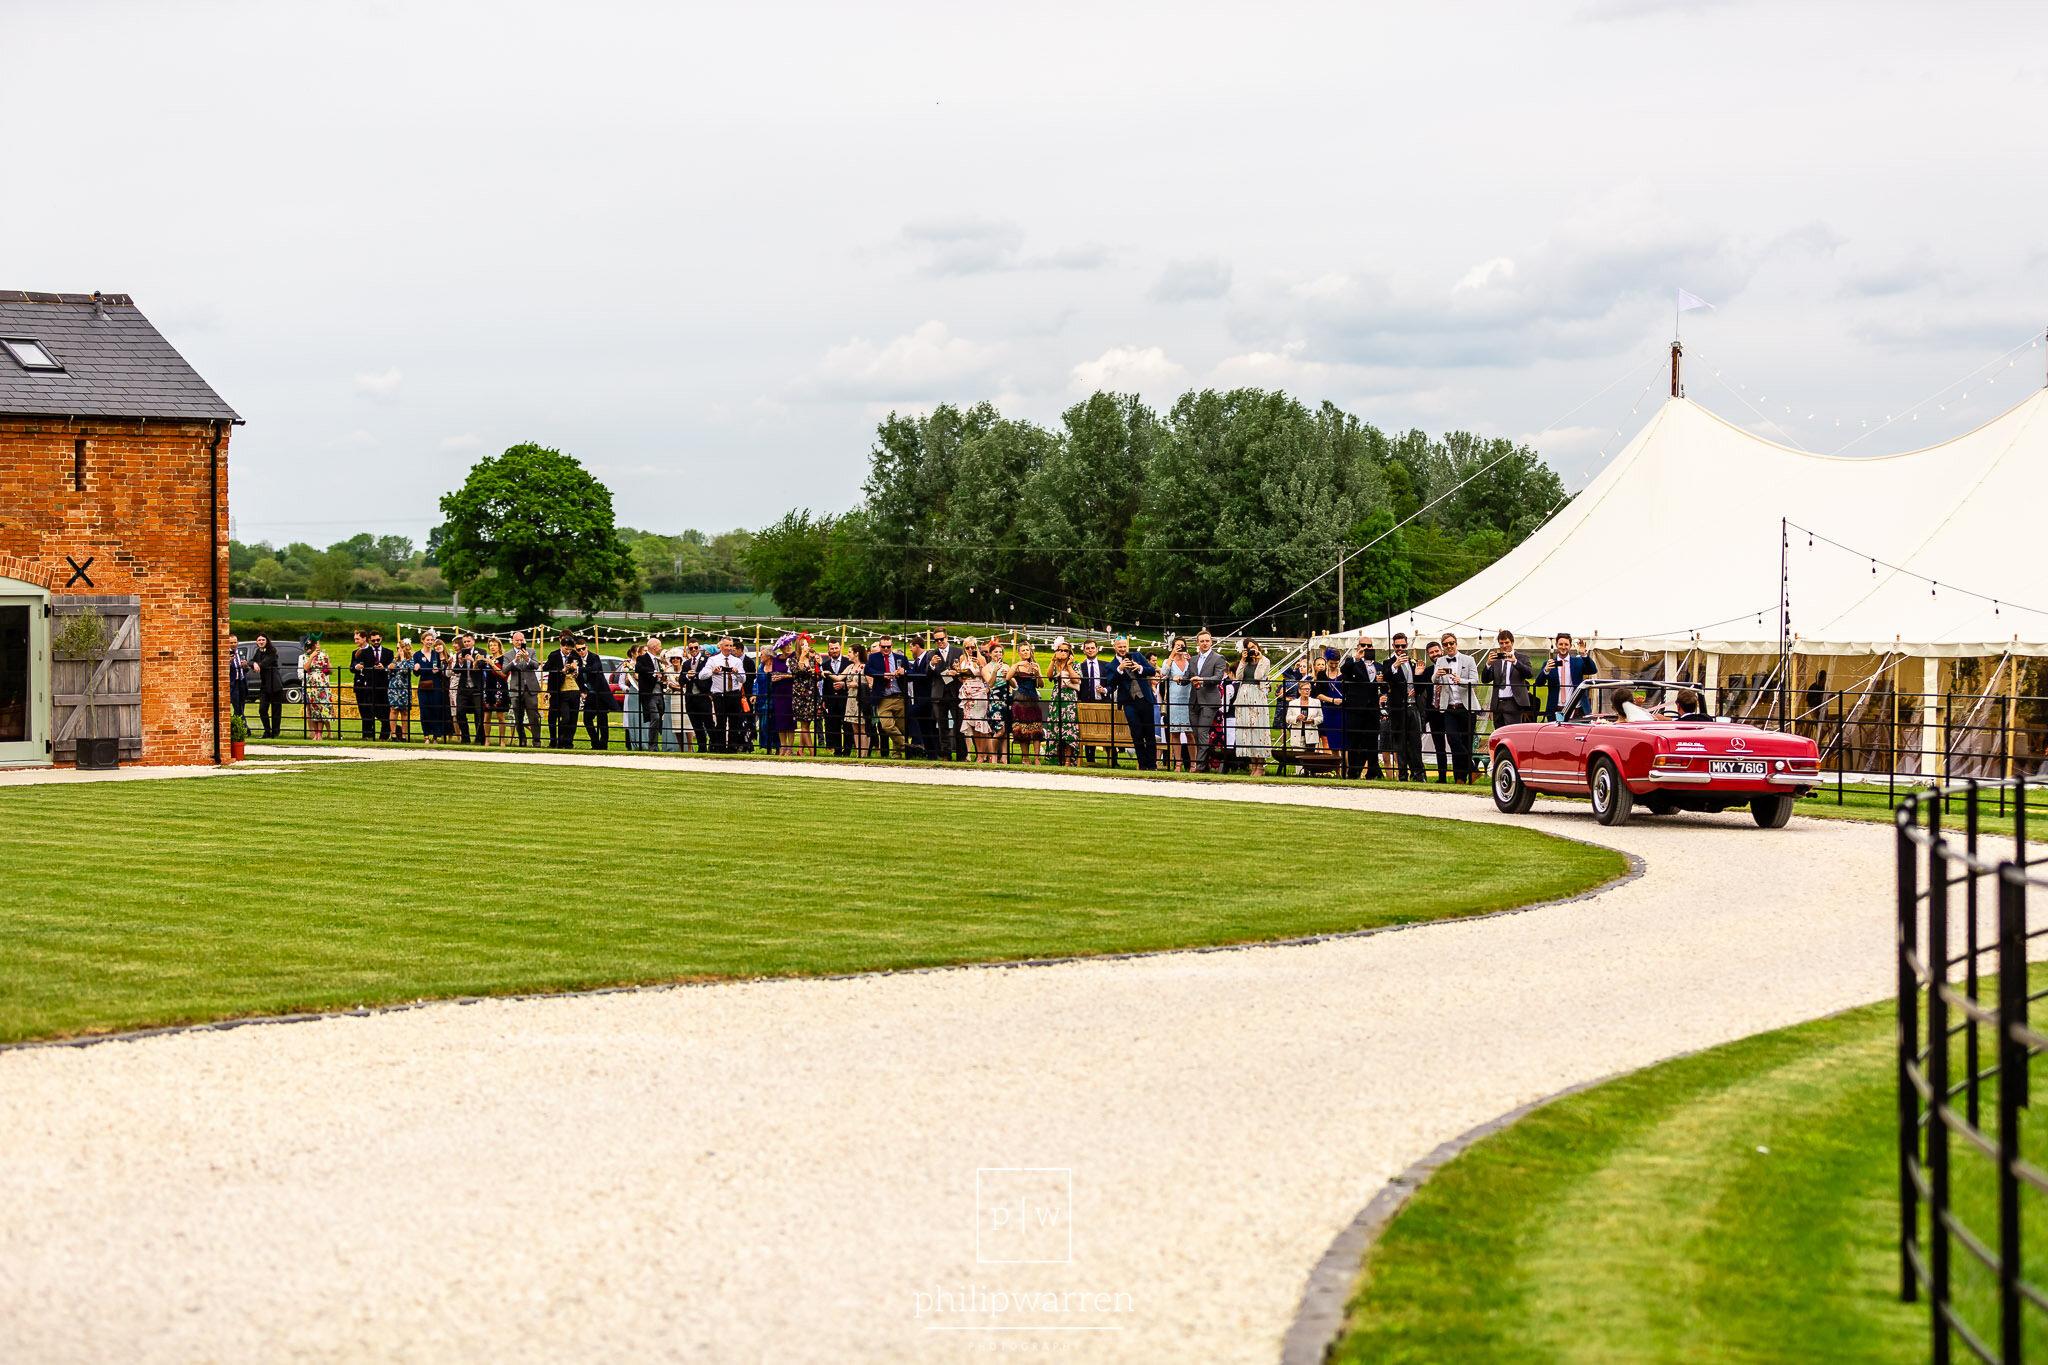 Countryside Marquee Wedding - 16.jpg